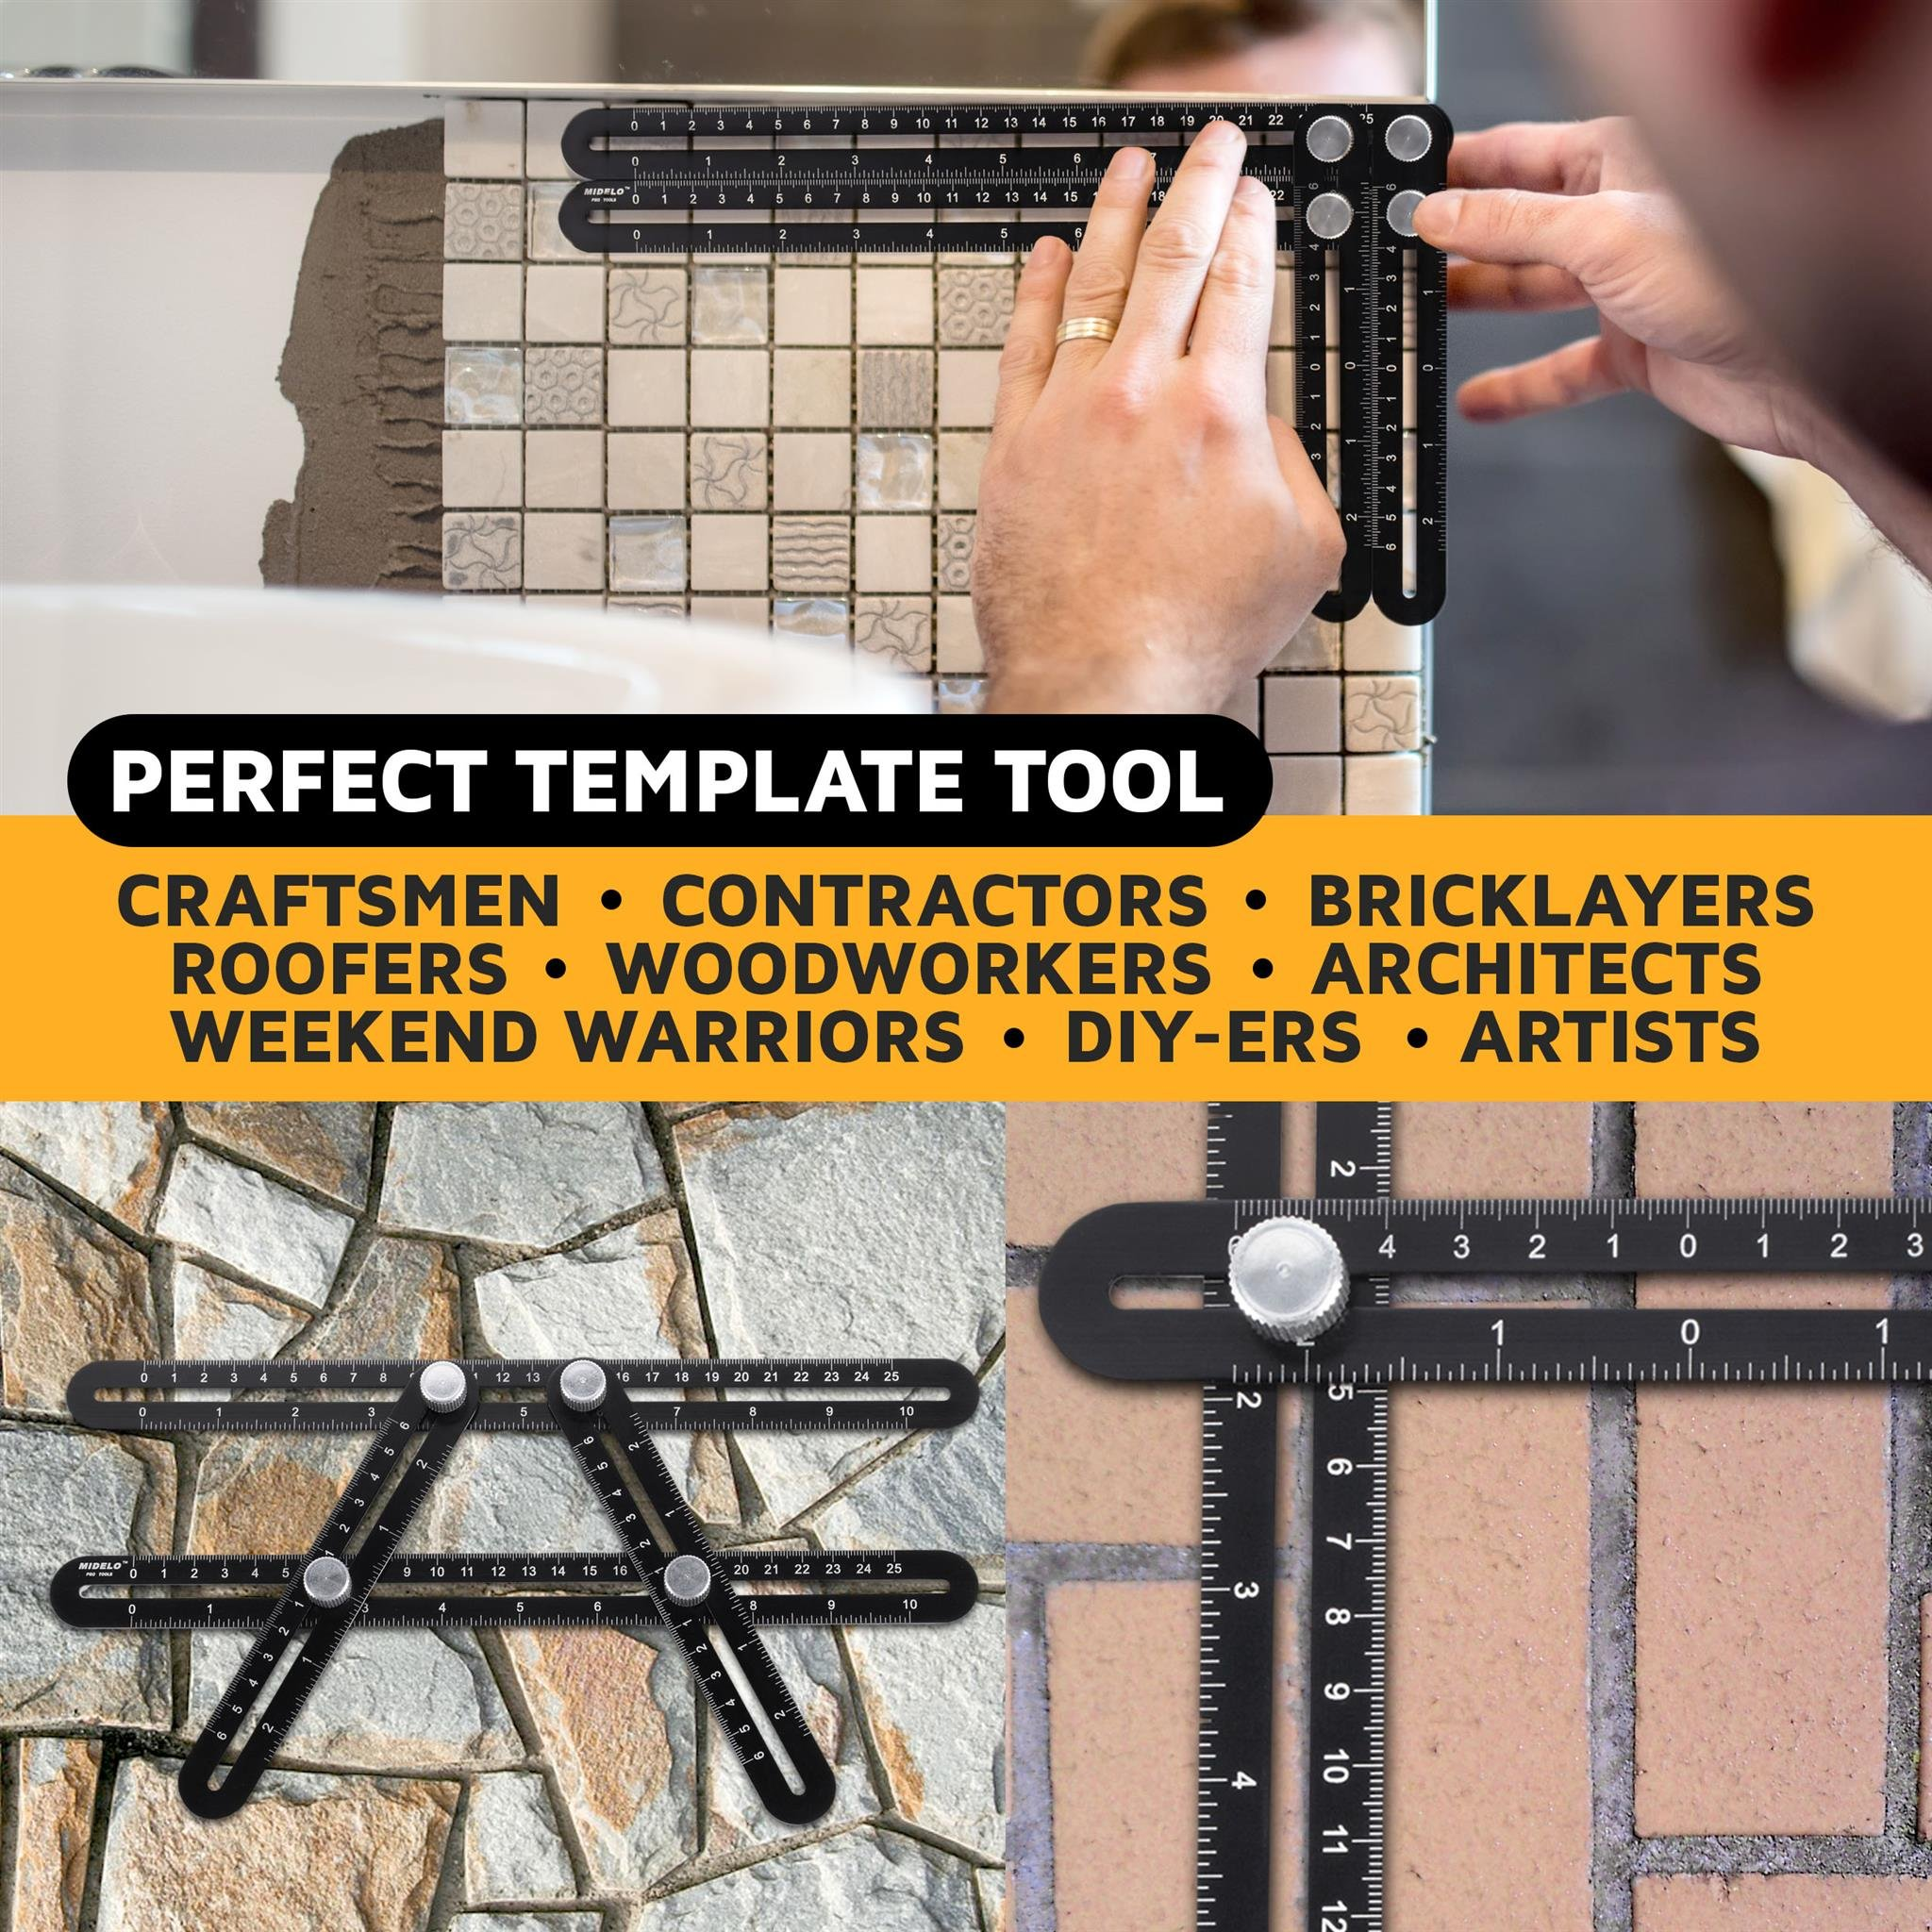 AngleBuddy by Midelo | Aluminum Metal Angleizer Template Tool | Multi Angle Measuring Ruler Angularizer | Ultimate Irregular Shape Layout Copy Anglulizer | BONUS 6-in-1 Multi Tool & Bubble Level by Midelo (Image #3)